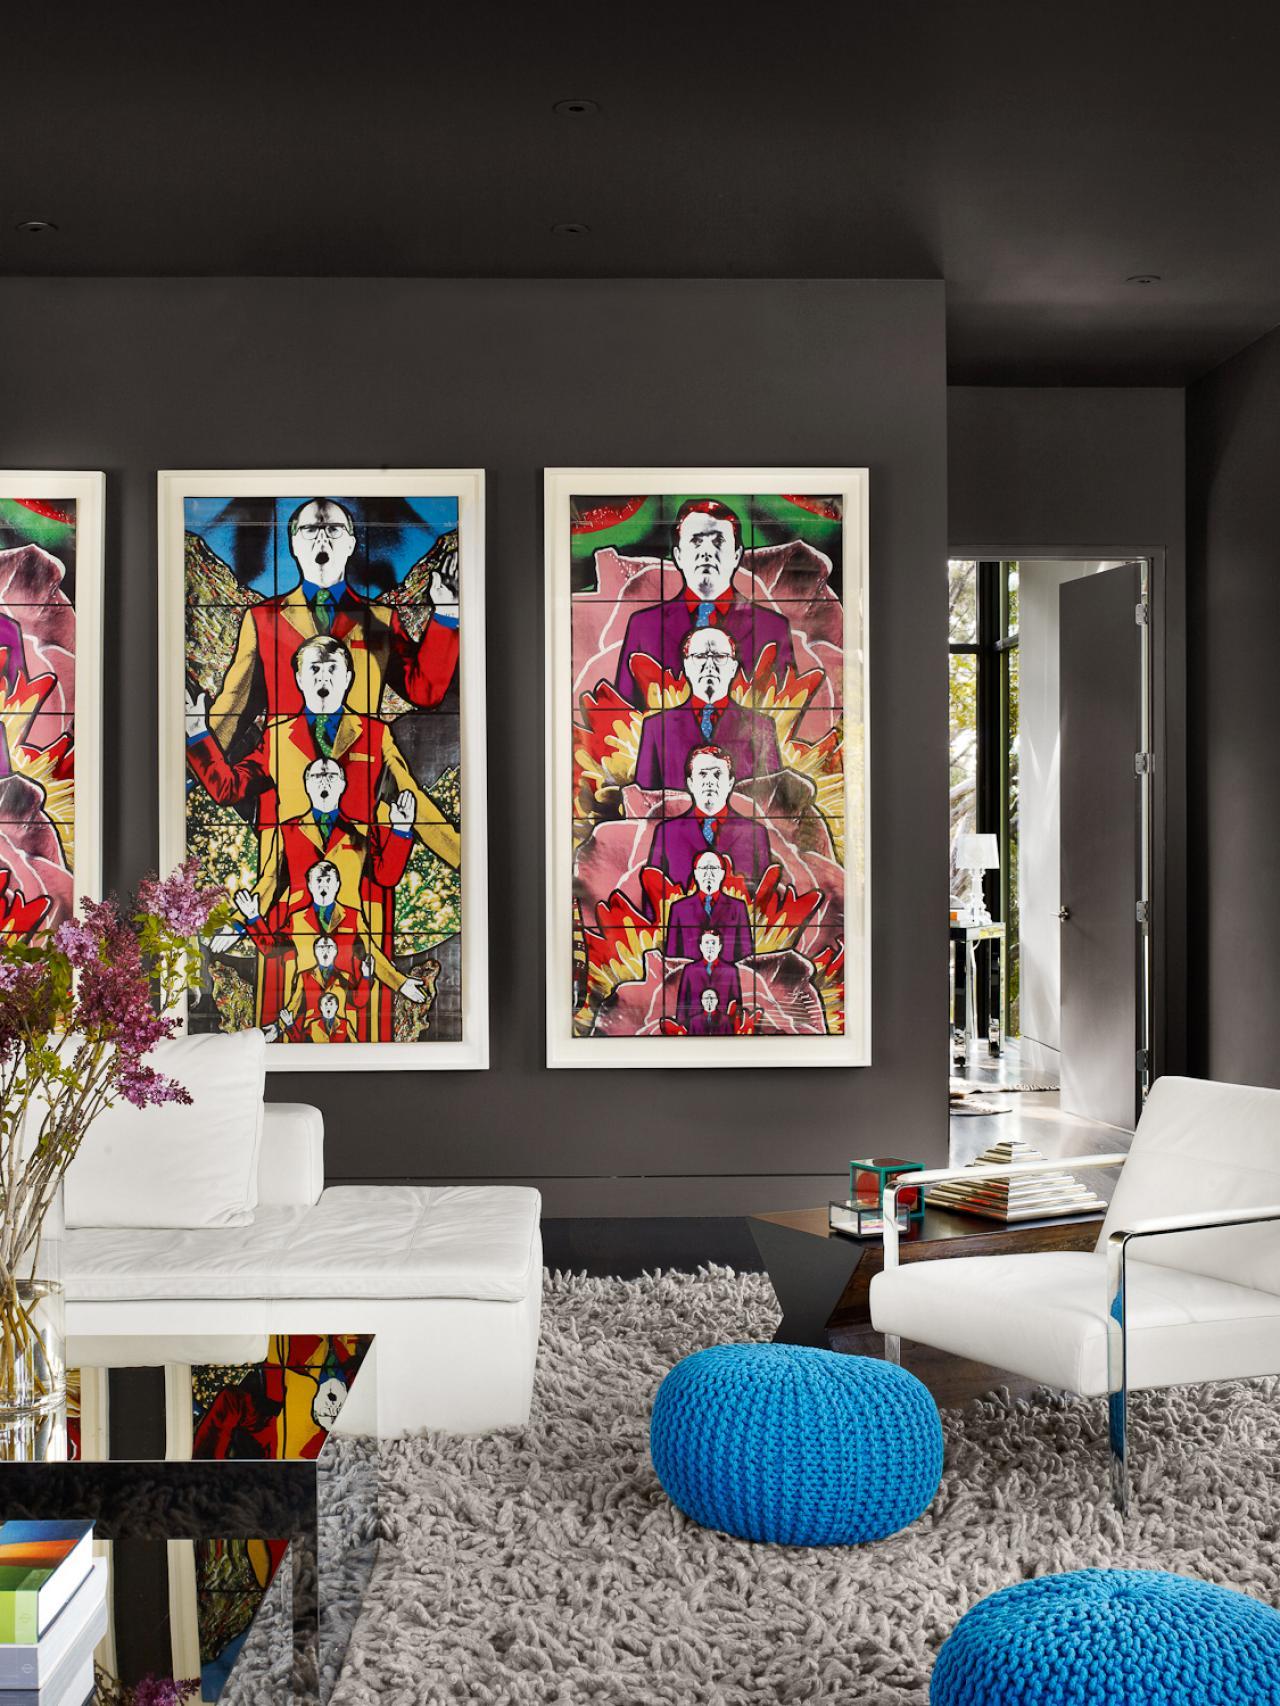 Vibrant Pop Art Wows in Deep Gray Living Room | HGTV